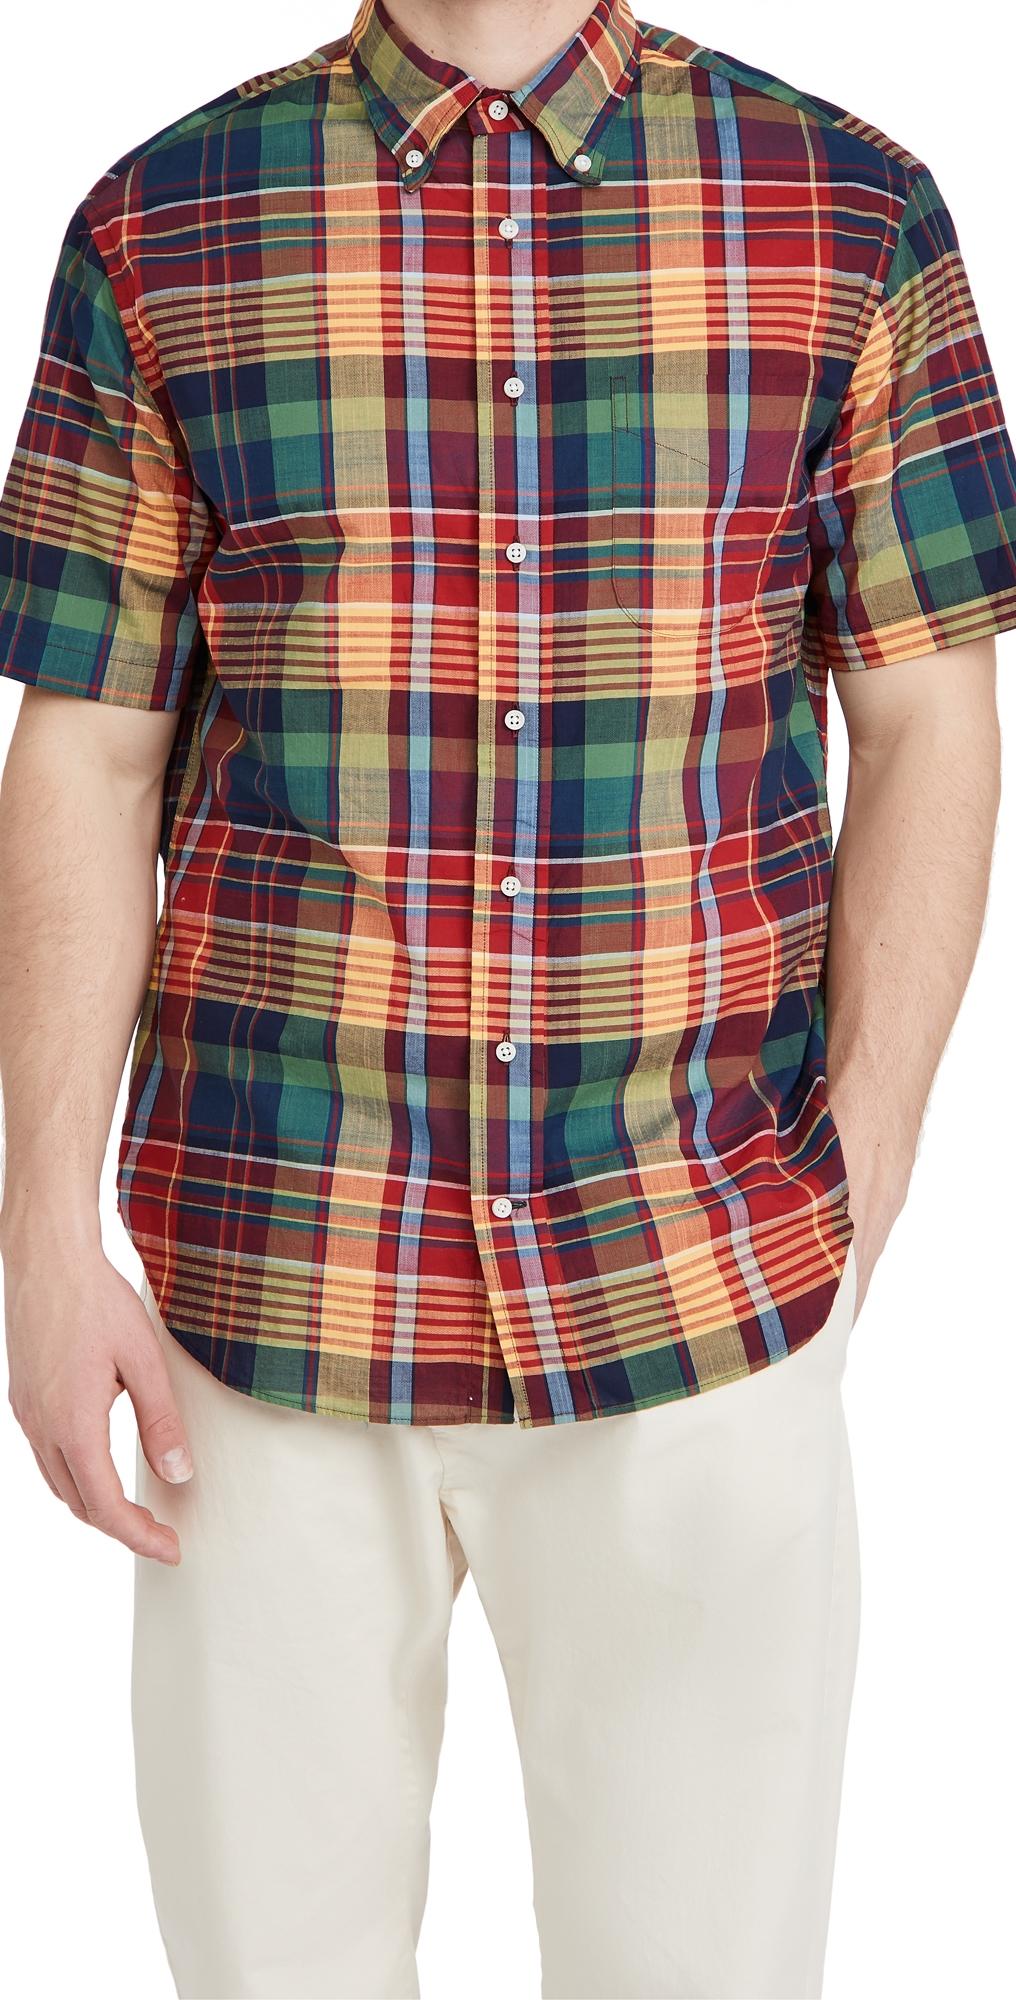 Archive Madras Short Sleeve Shirt